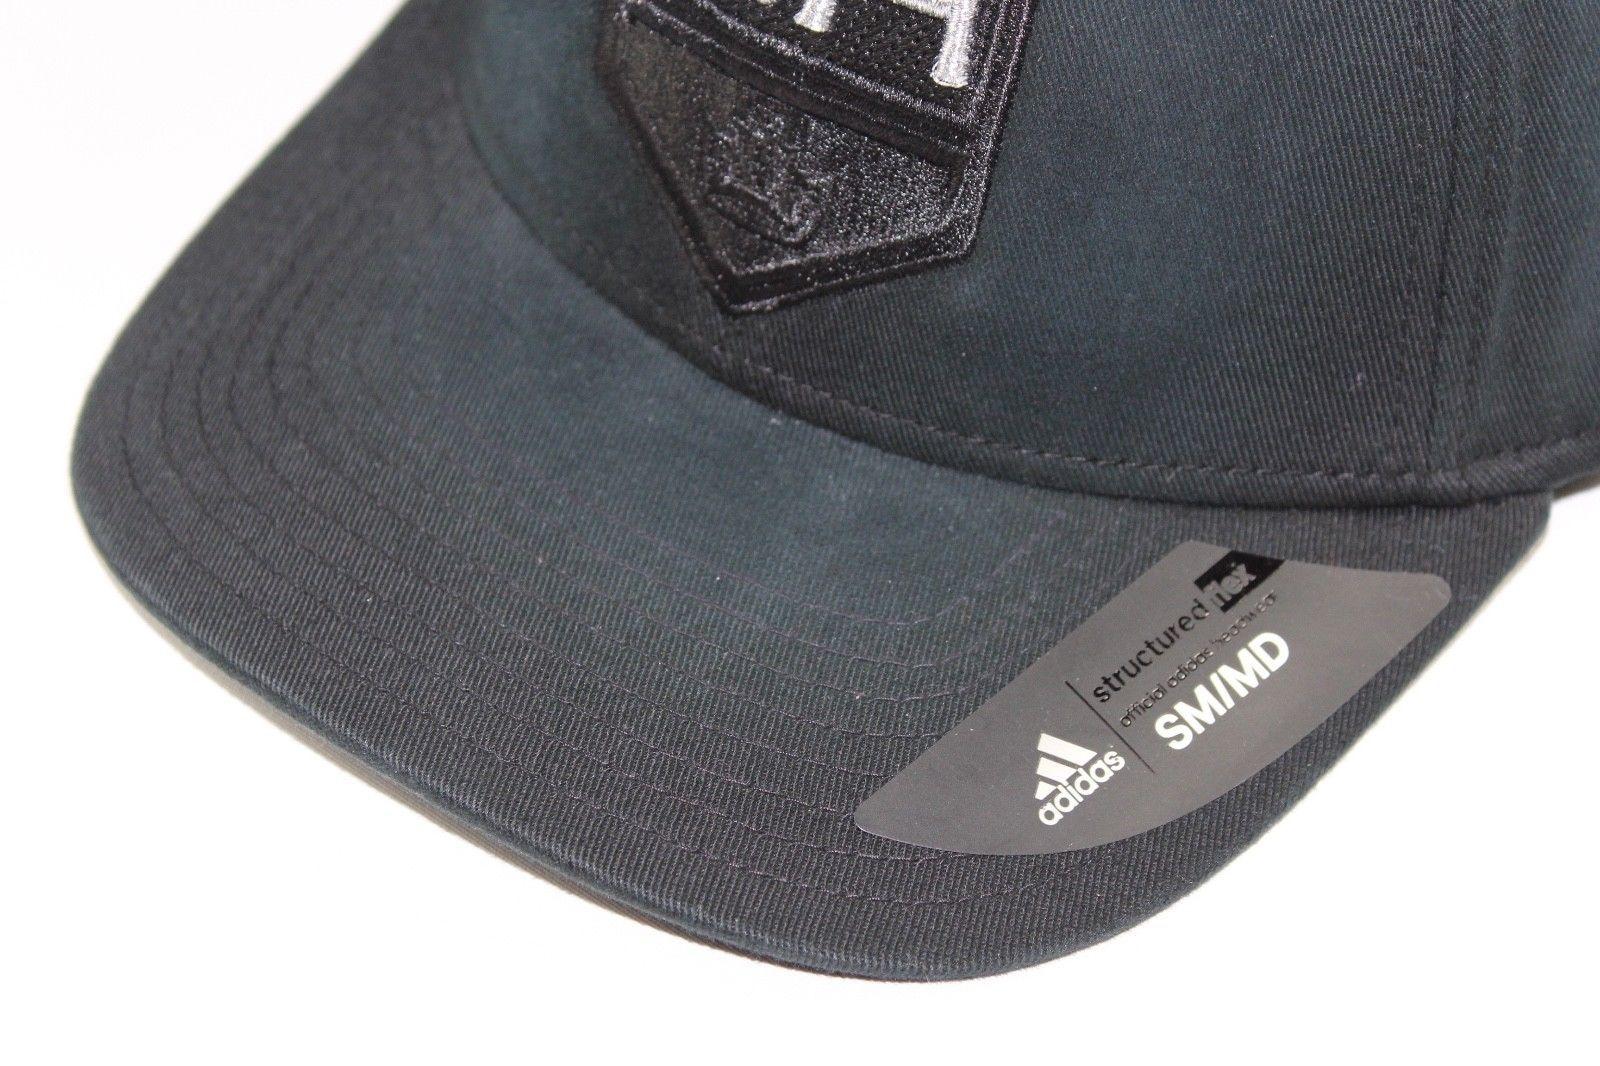 ca6804805f3a New Sample ADIDAS LA Kings Los Angeles Kings and 50 similar items